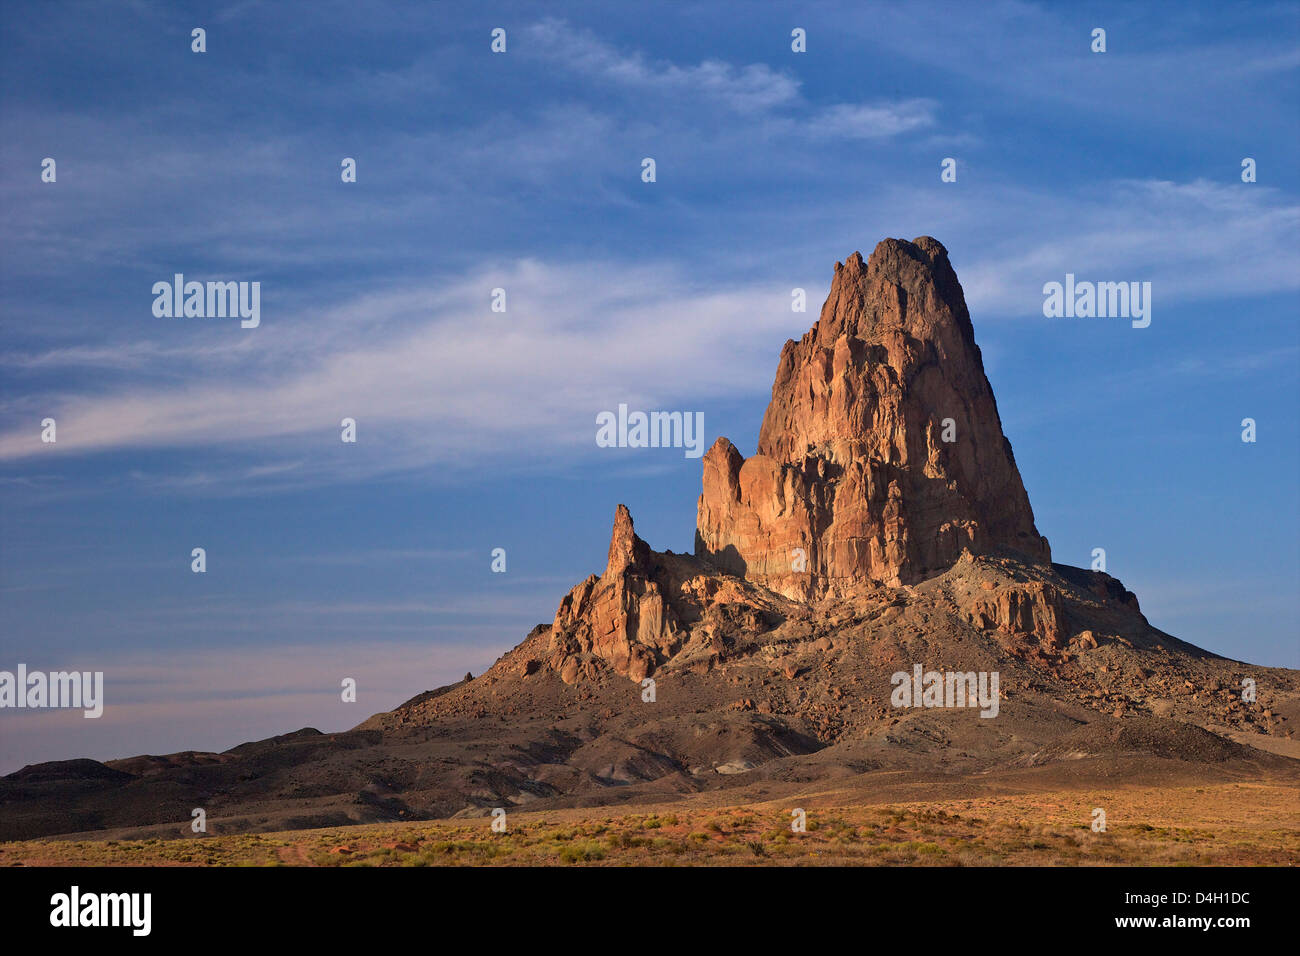 Morning sunlight on Agathia Peak (El Capita),  near Monument Valley, on Arizona Highway 163, Arizona, USA - Stock Image